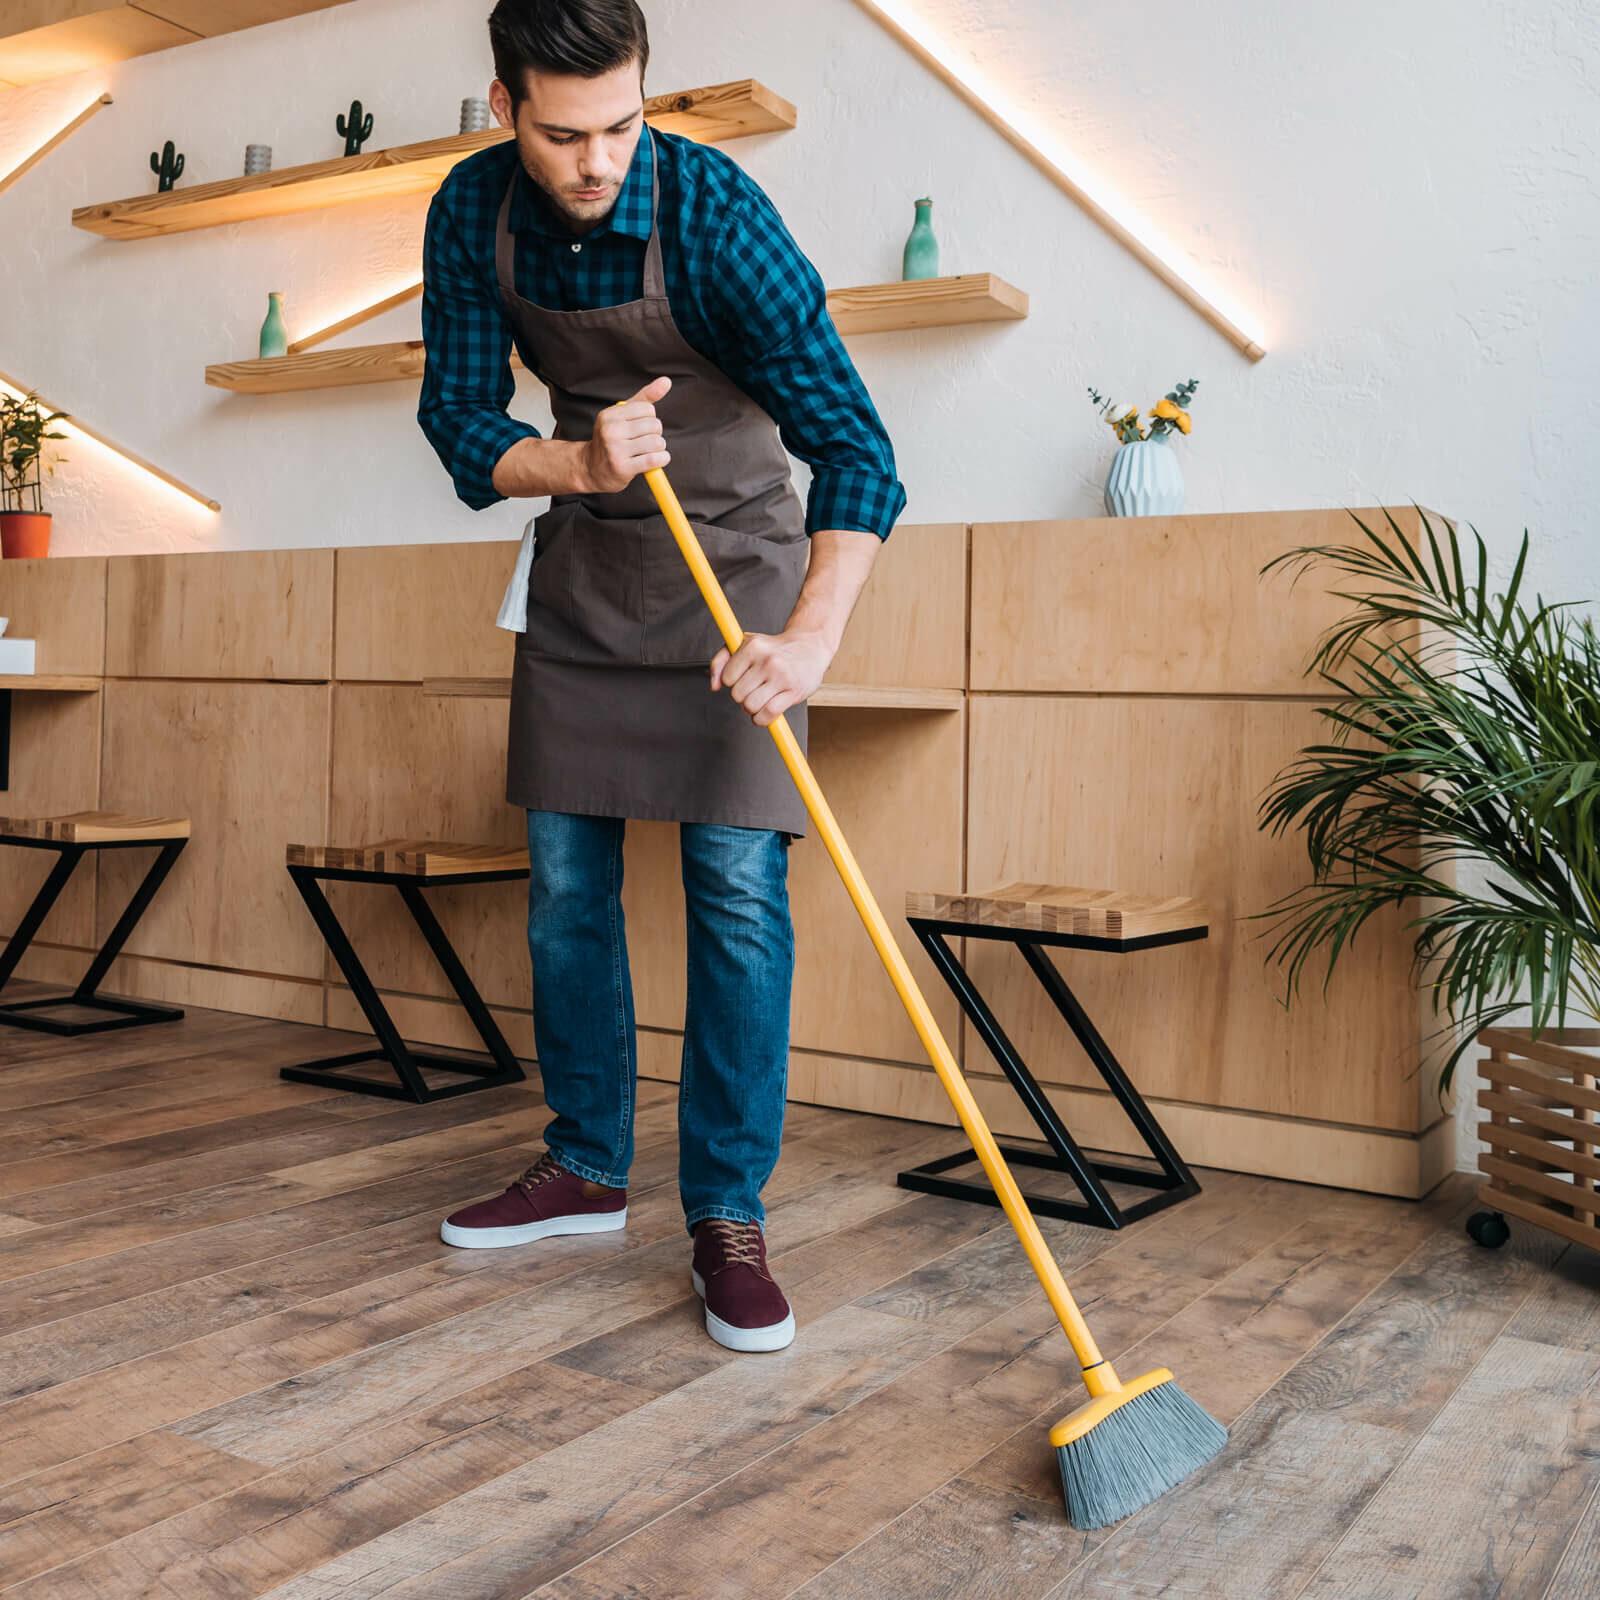 sweeping harwood | Tish flooring